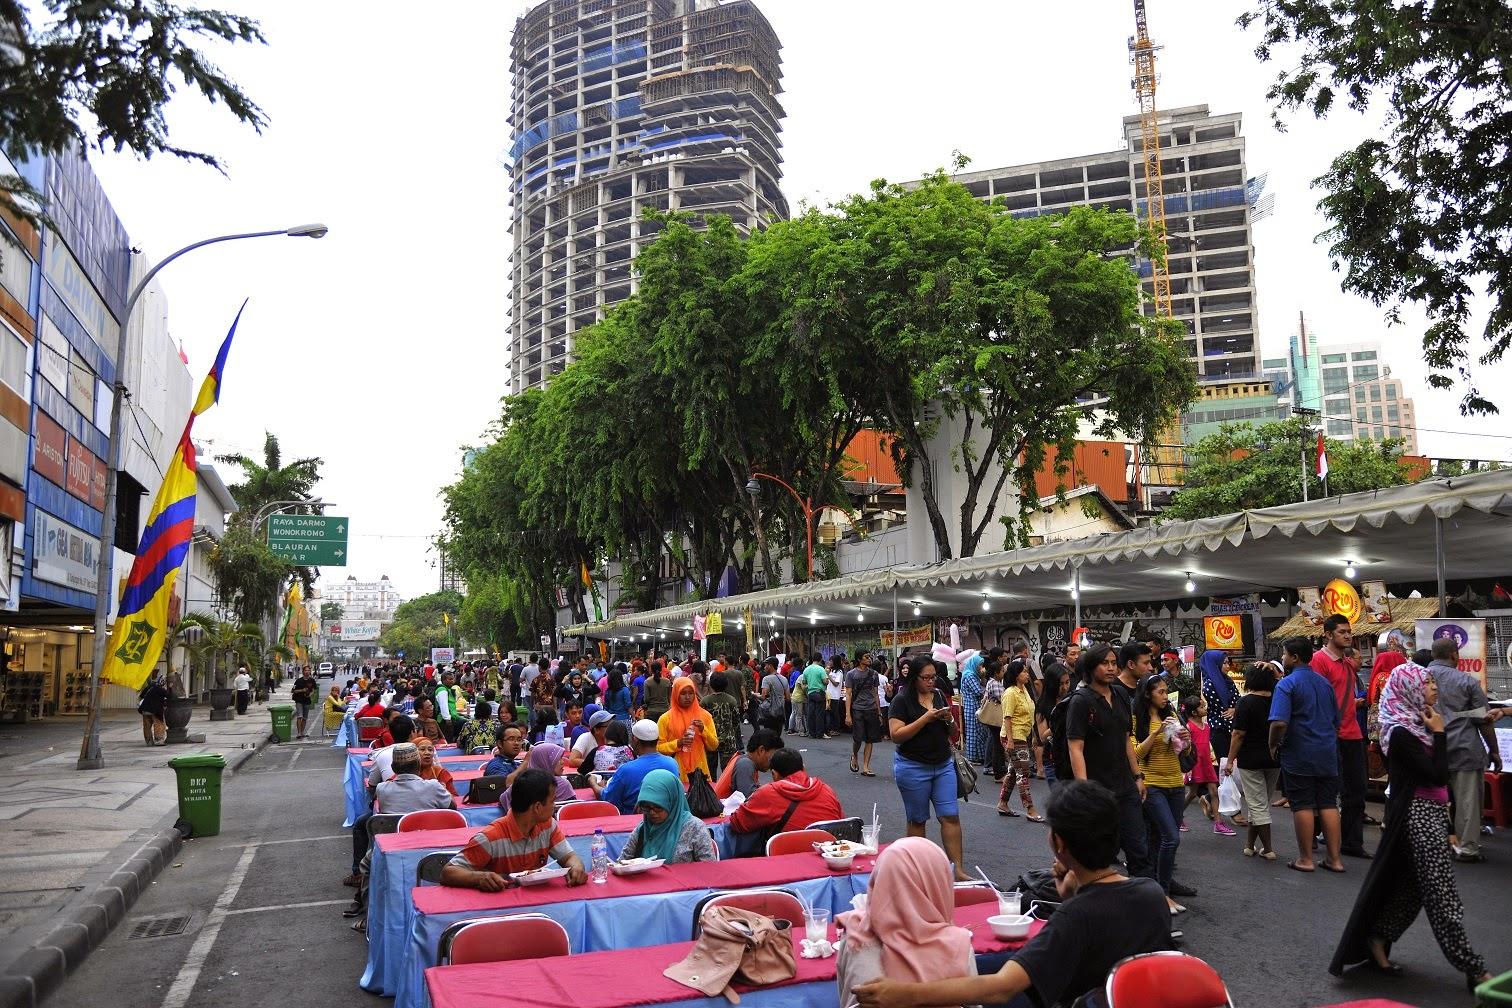 Sambut Hari Pahlawan Festival Kuliner Jalan Tunjungan Surabaya Media Bidik